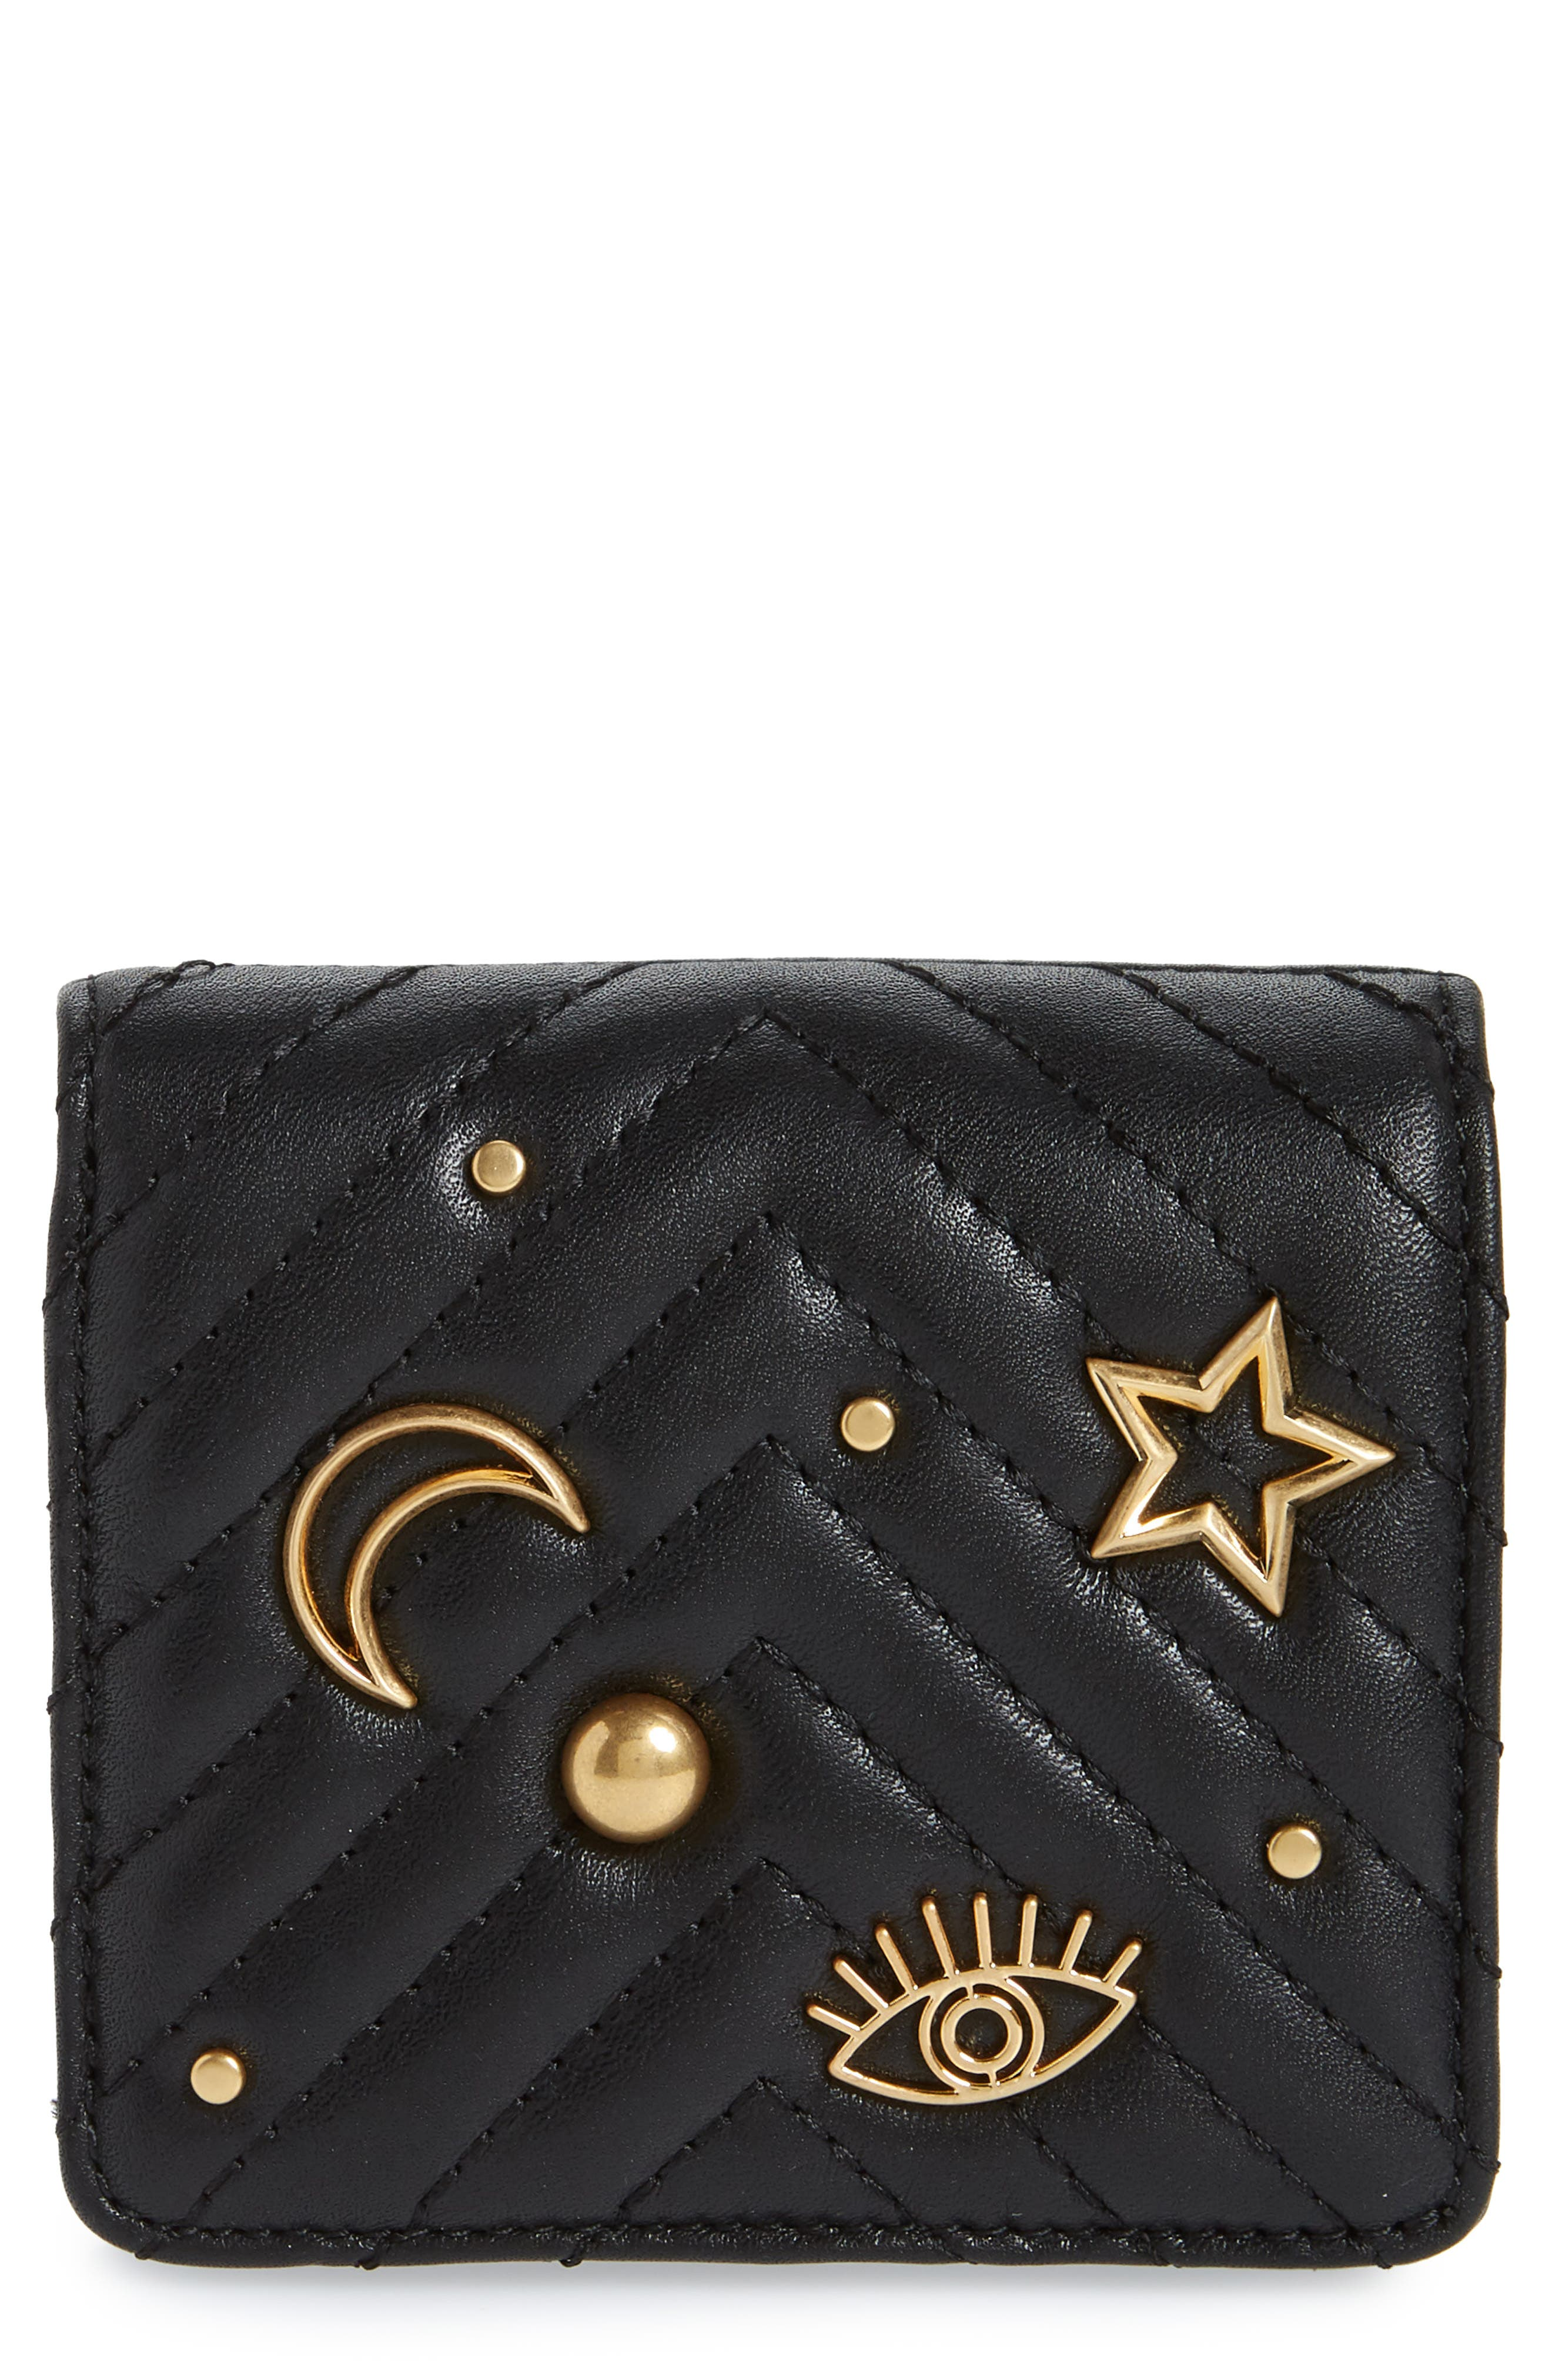 Rebecca Minkoff Half Snap Calfskin Leather Wallet